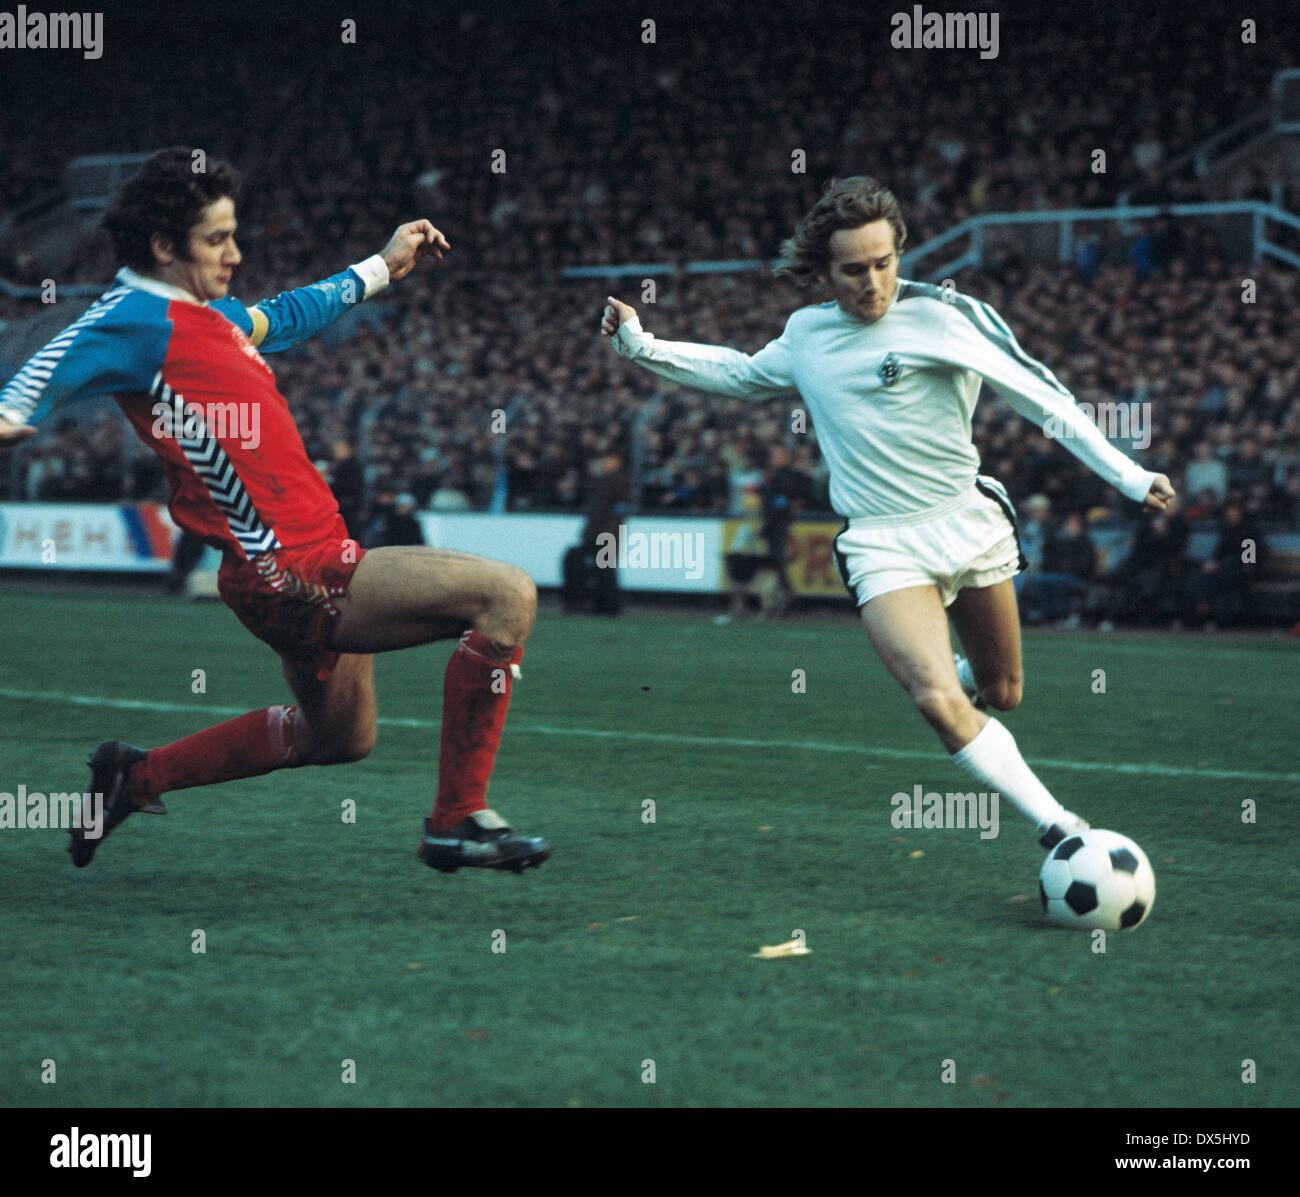 football, Bundesliga, 1975/1976, Grotenburg Stadium, FC Bayer 05 Uerdingen versus Borussia Moenchengladbach 1:1, scene of the match, Allan Simonsen (MG) right and Paul Hahn (Uerdingen) - Stock Image